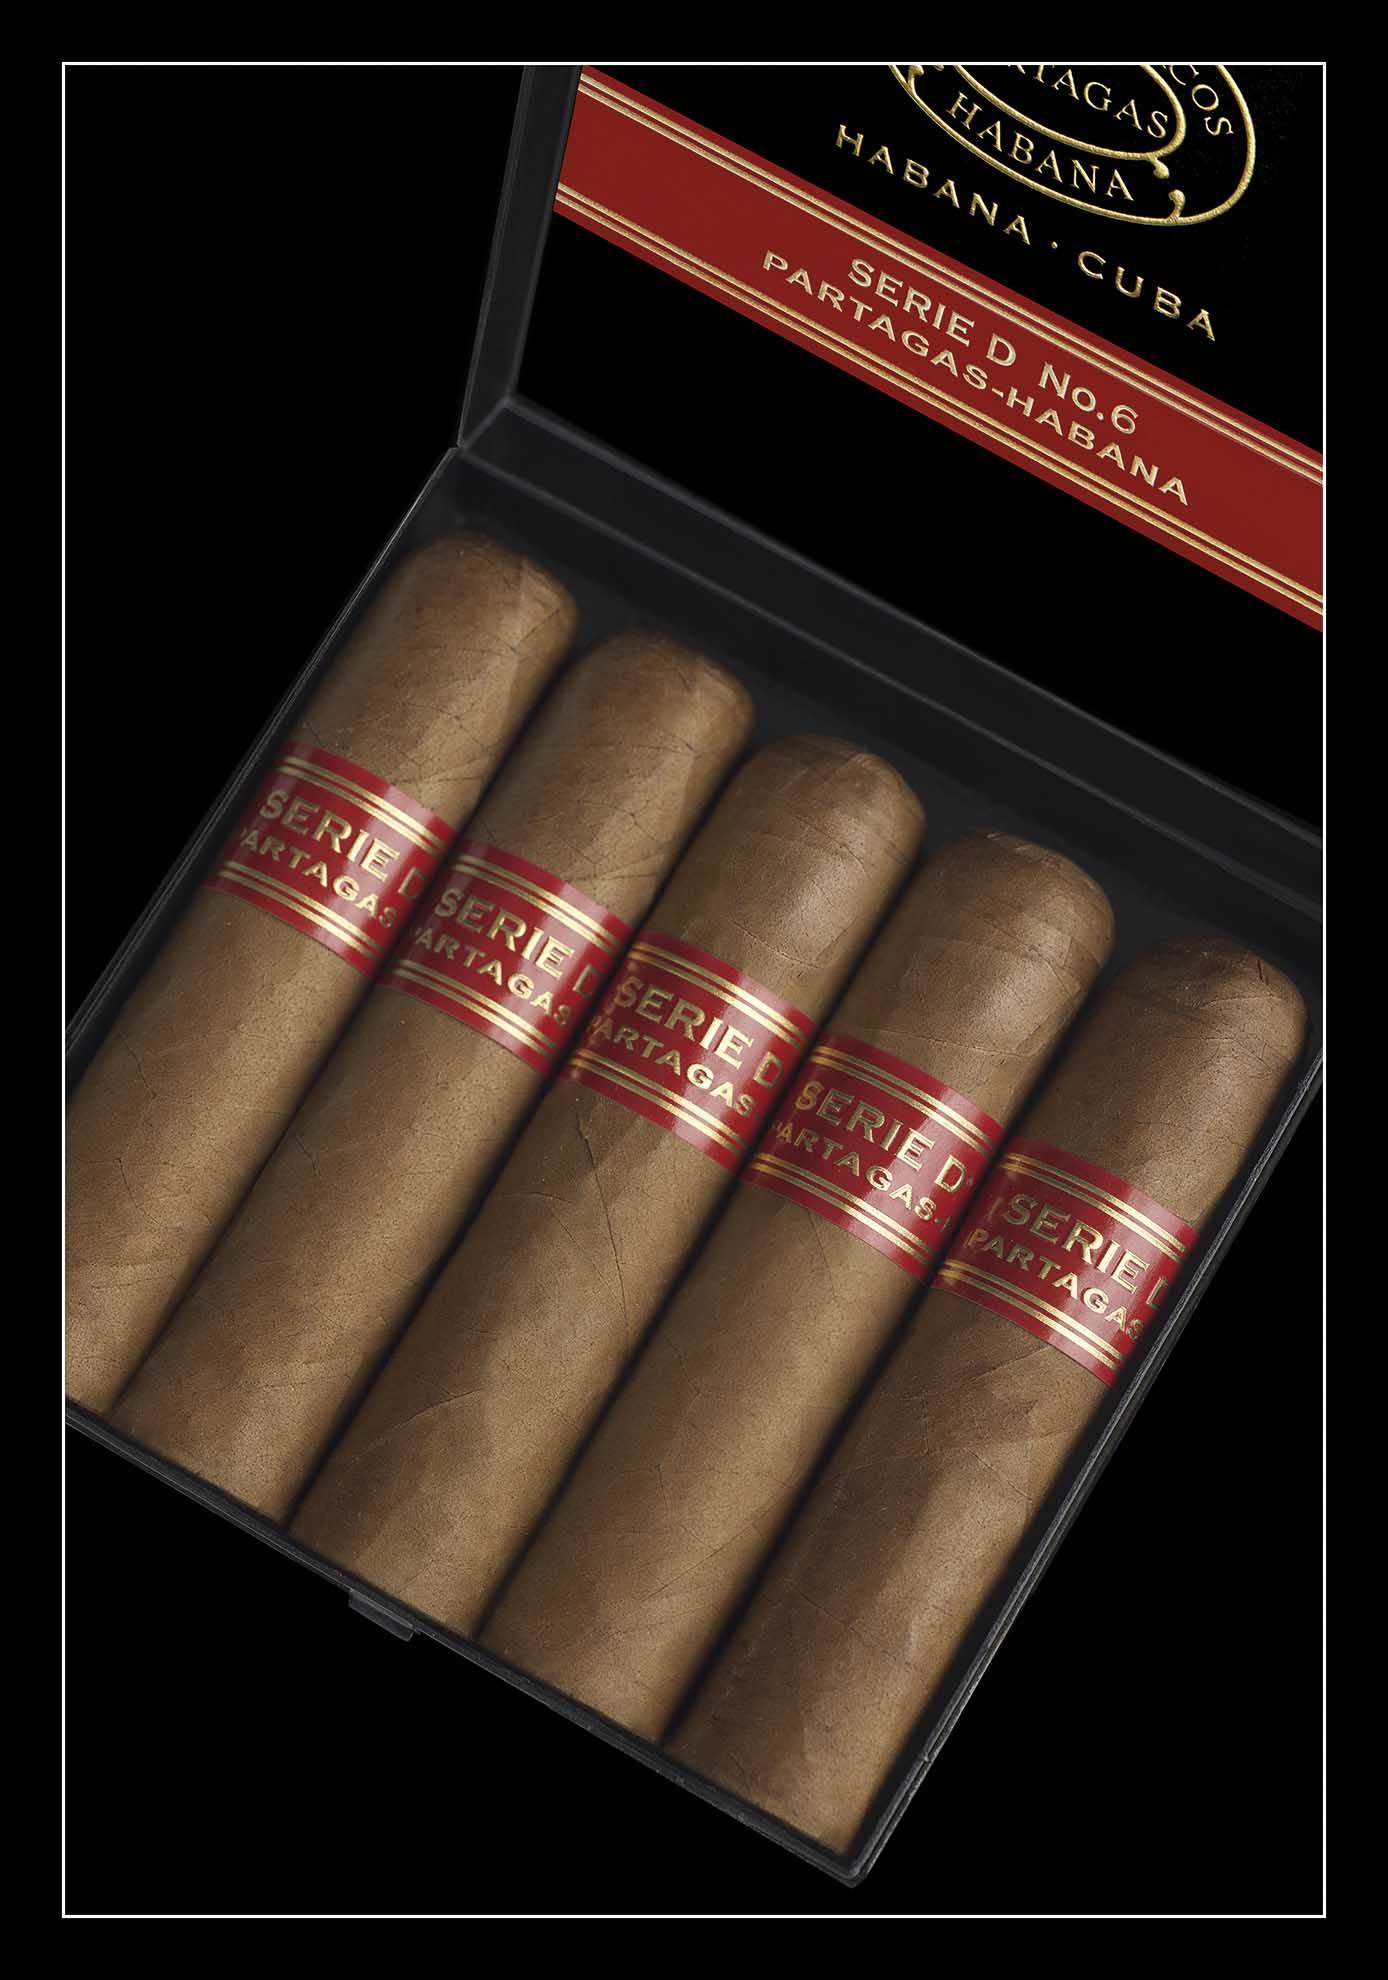 Cigar News Partag 225 S Serie D No 6 All The Taste In A